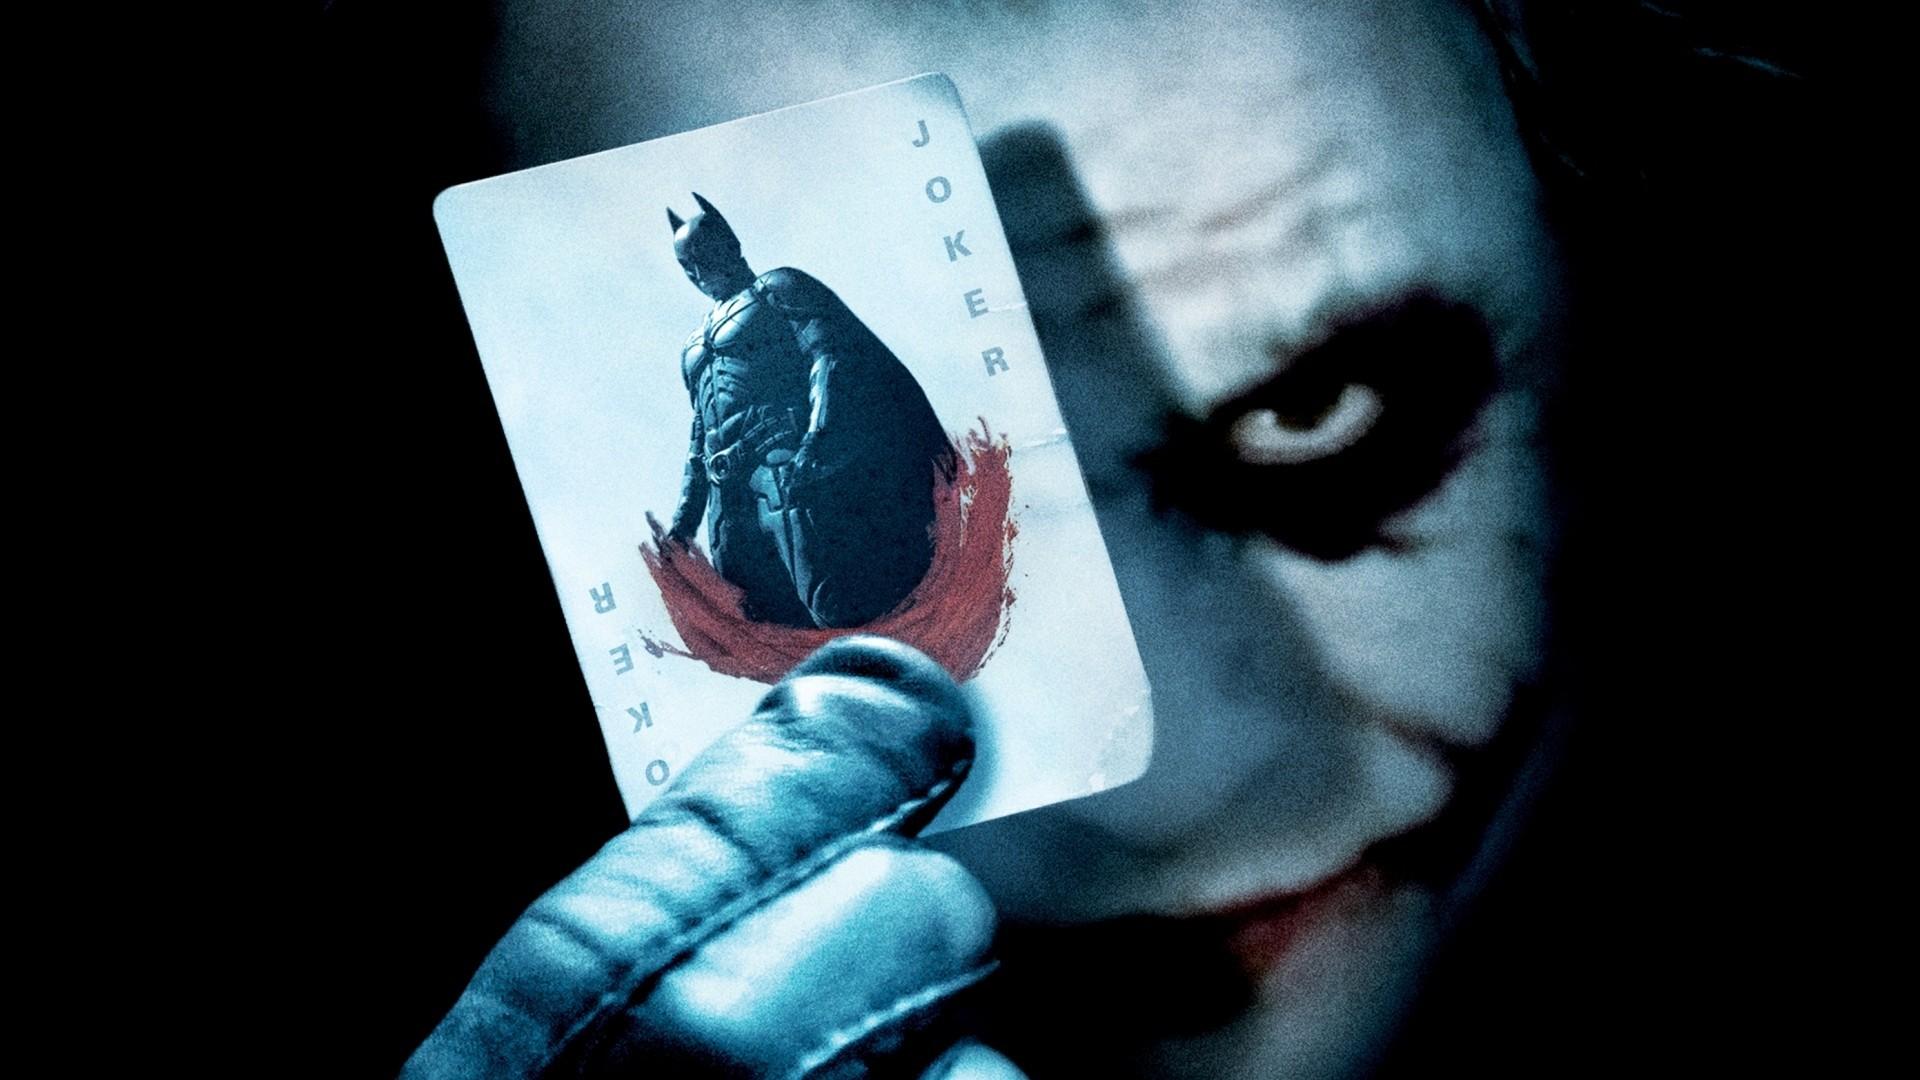 Hd wallpaper batman - Batman Joker Card Wallpapers Hd Wallpapers